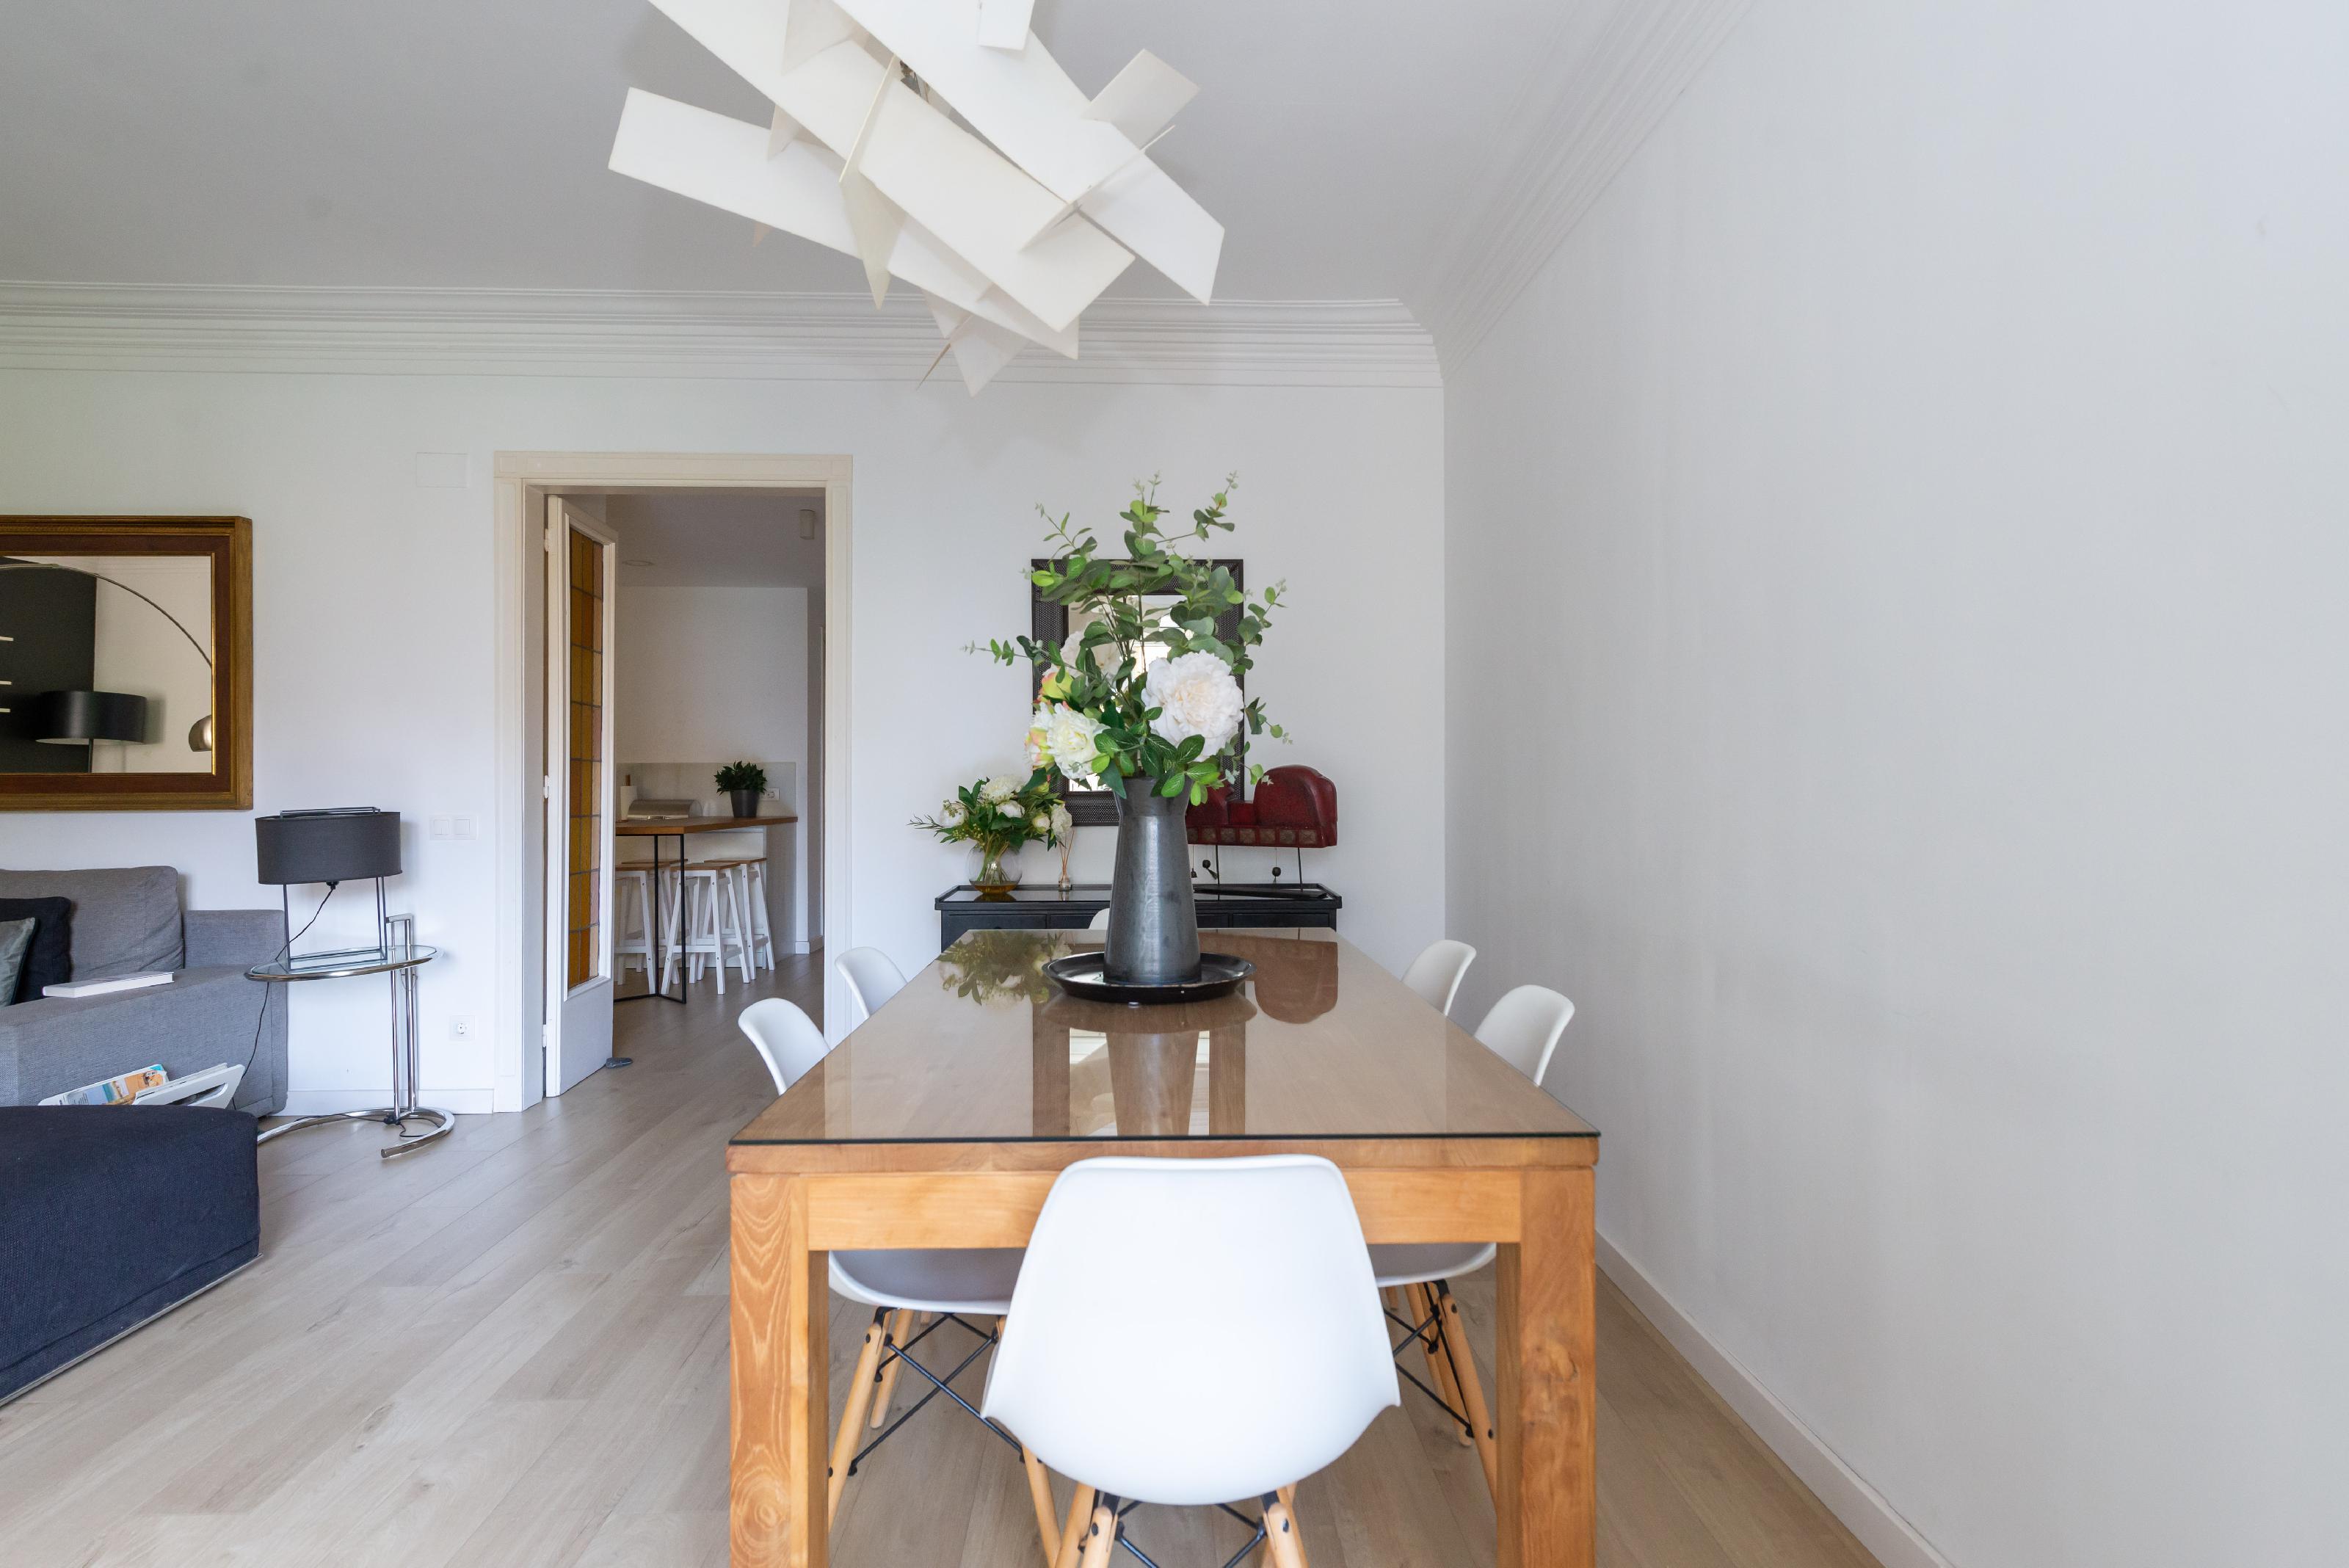 250005 Flat for sale in Sarrià-Sant Gervasi, Sant Gervasi-Galvany 10